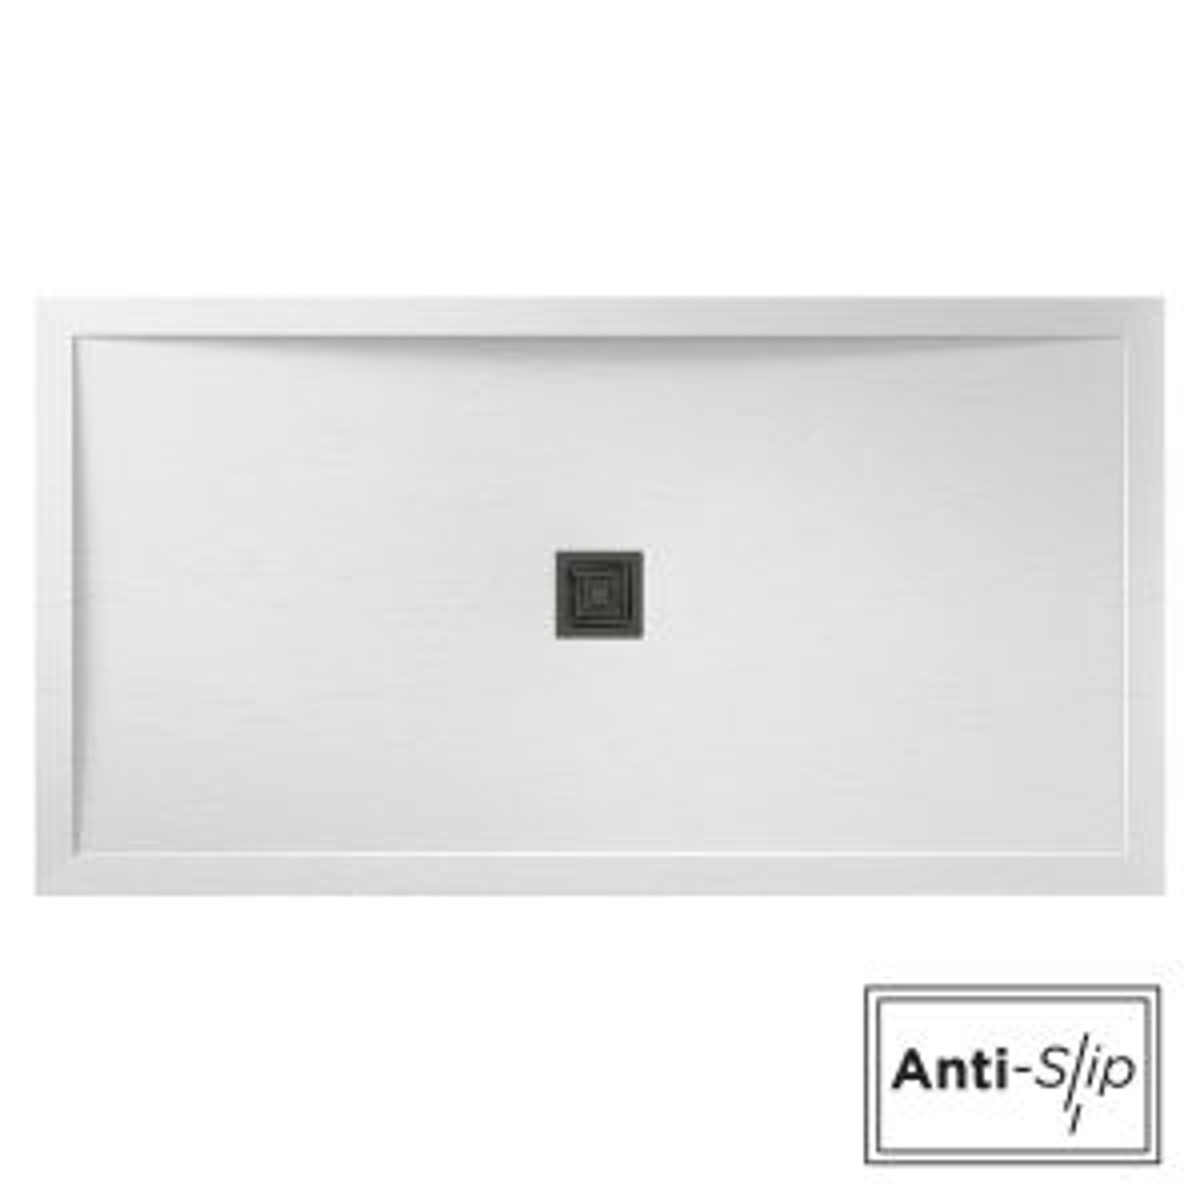 Aqualavo White Slate Shower Tray 1700 x 800